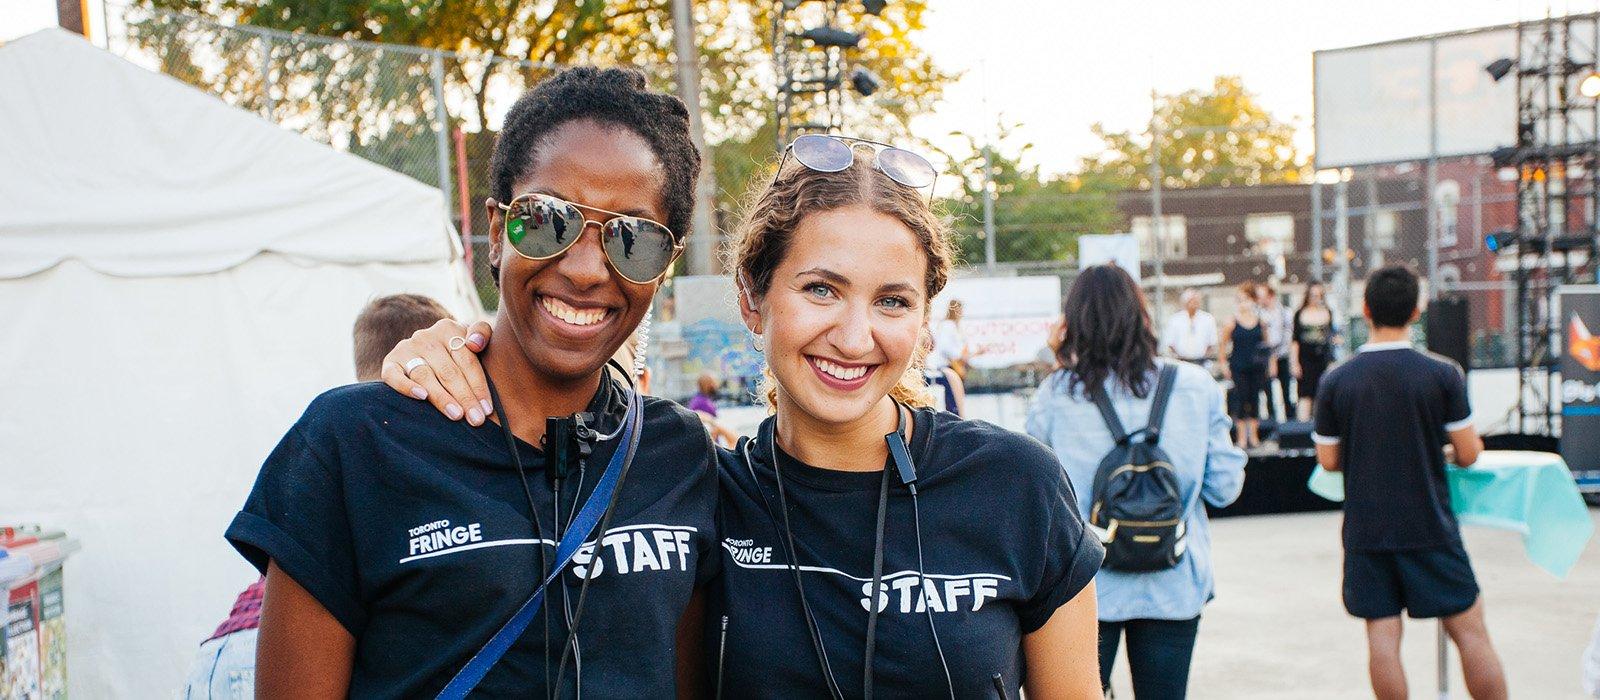 Smiling Fringe Staff